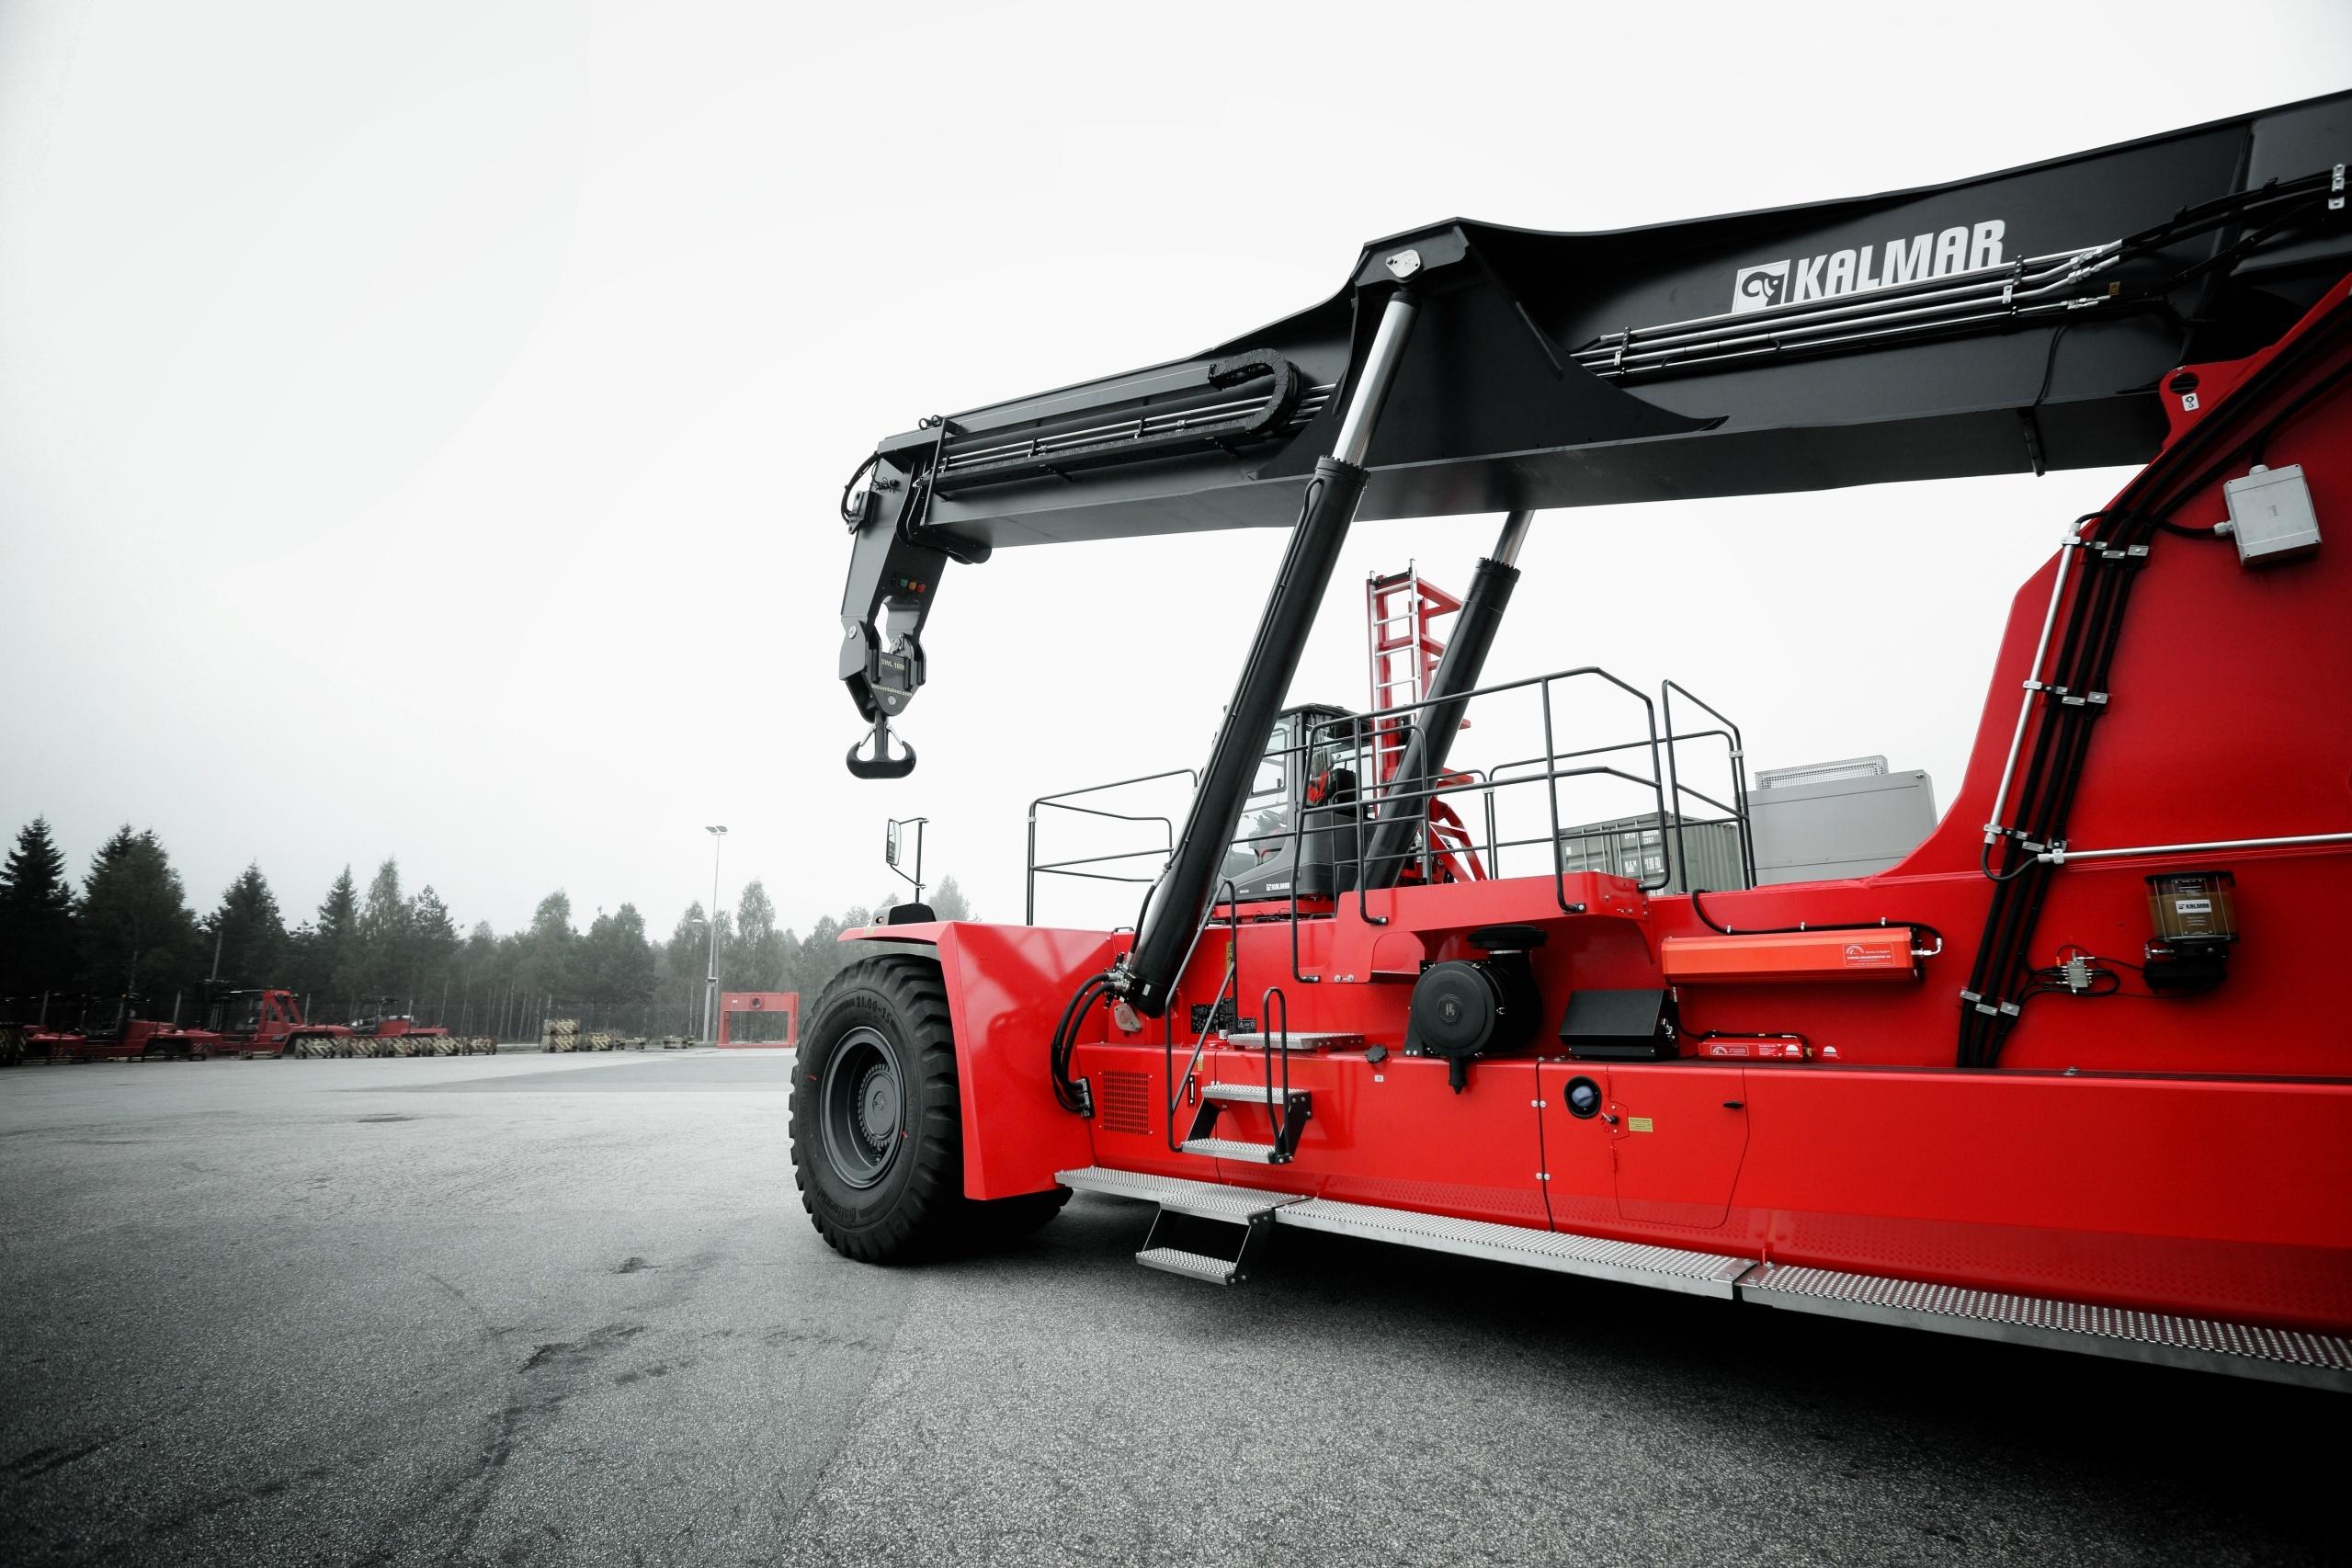 kalmar receives double order for the new super gloria reachstacker rh kalmarglobal com kalmar reach stacker specifications Kalmar Reach Stacker PDF